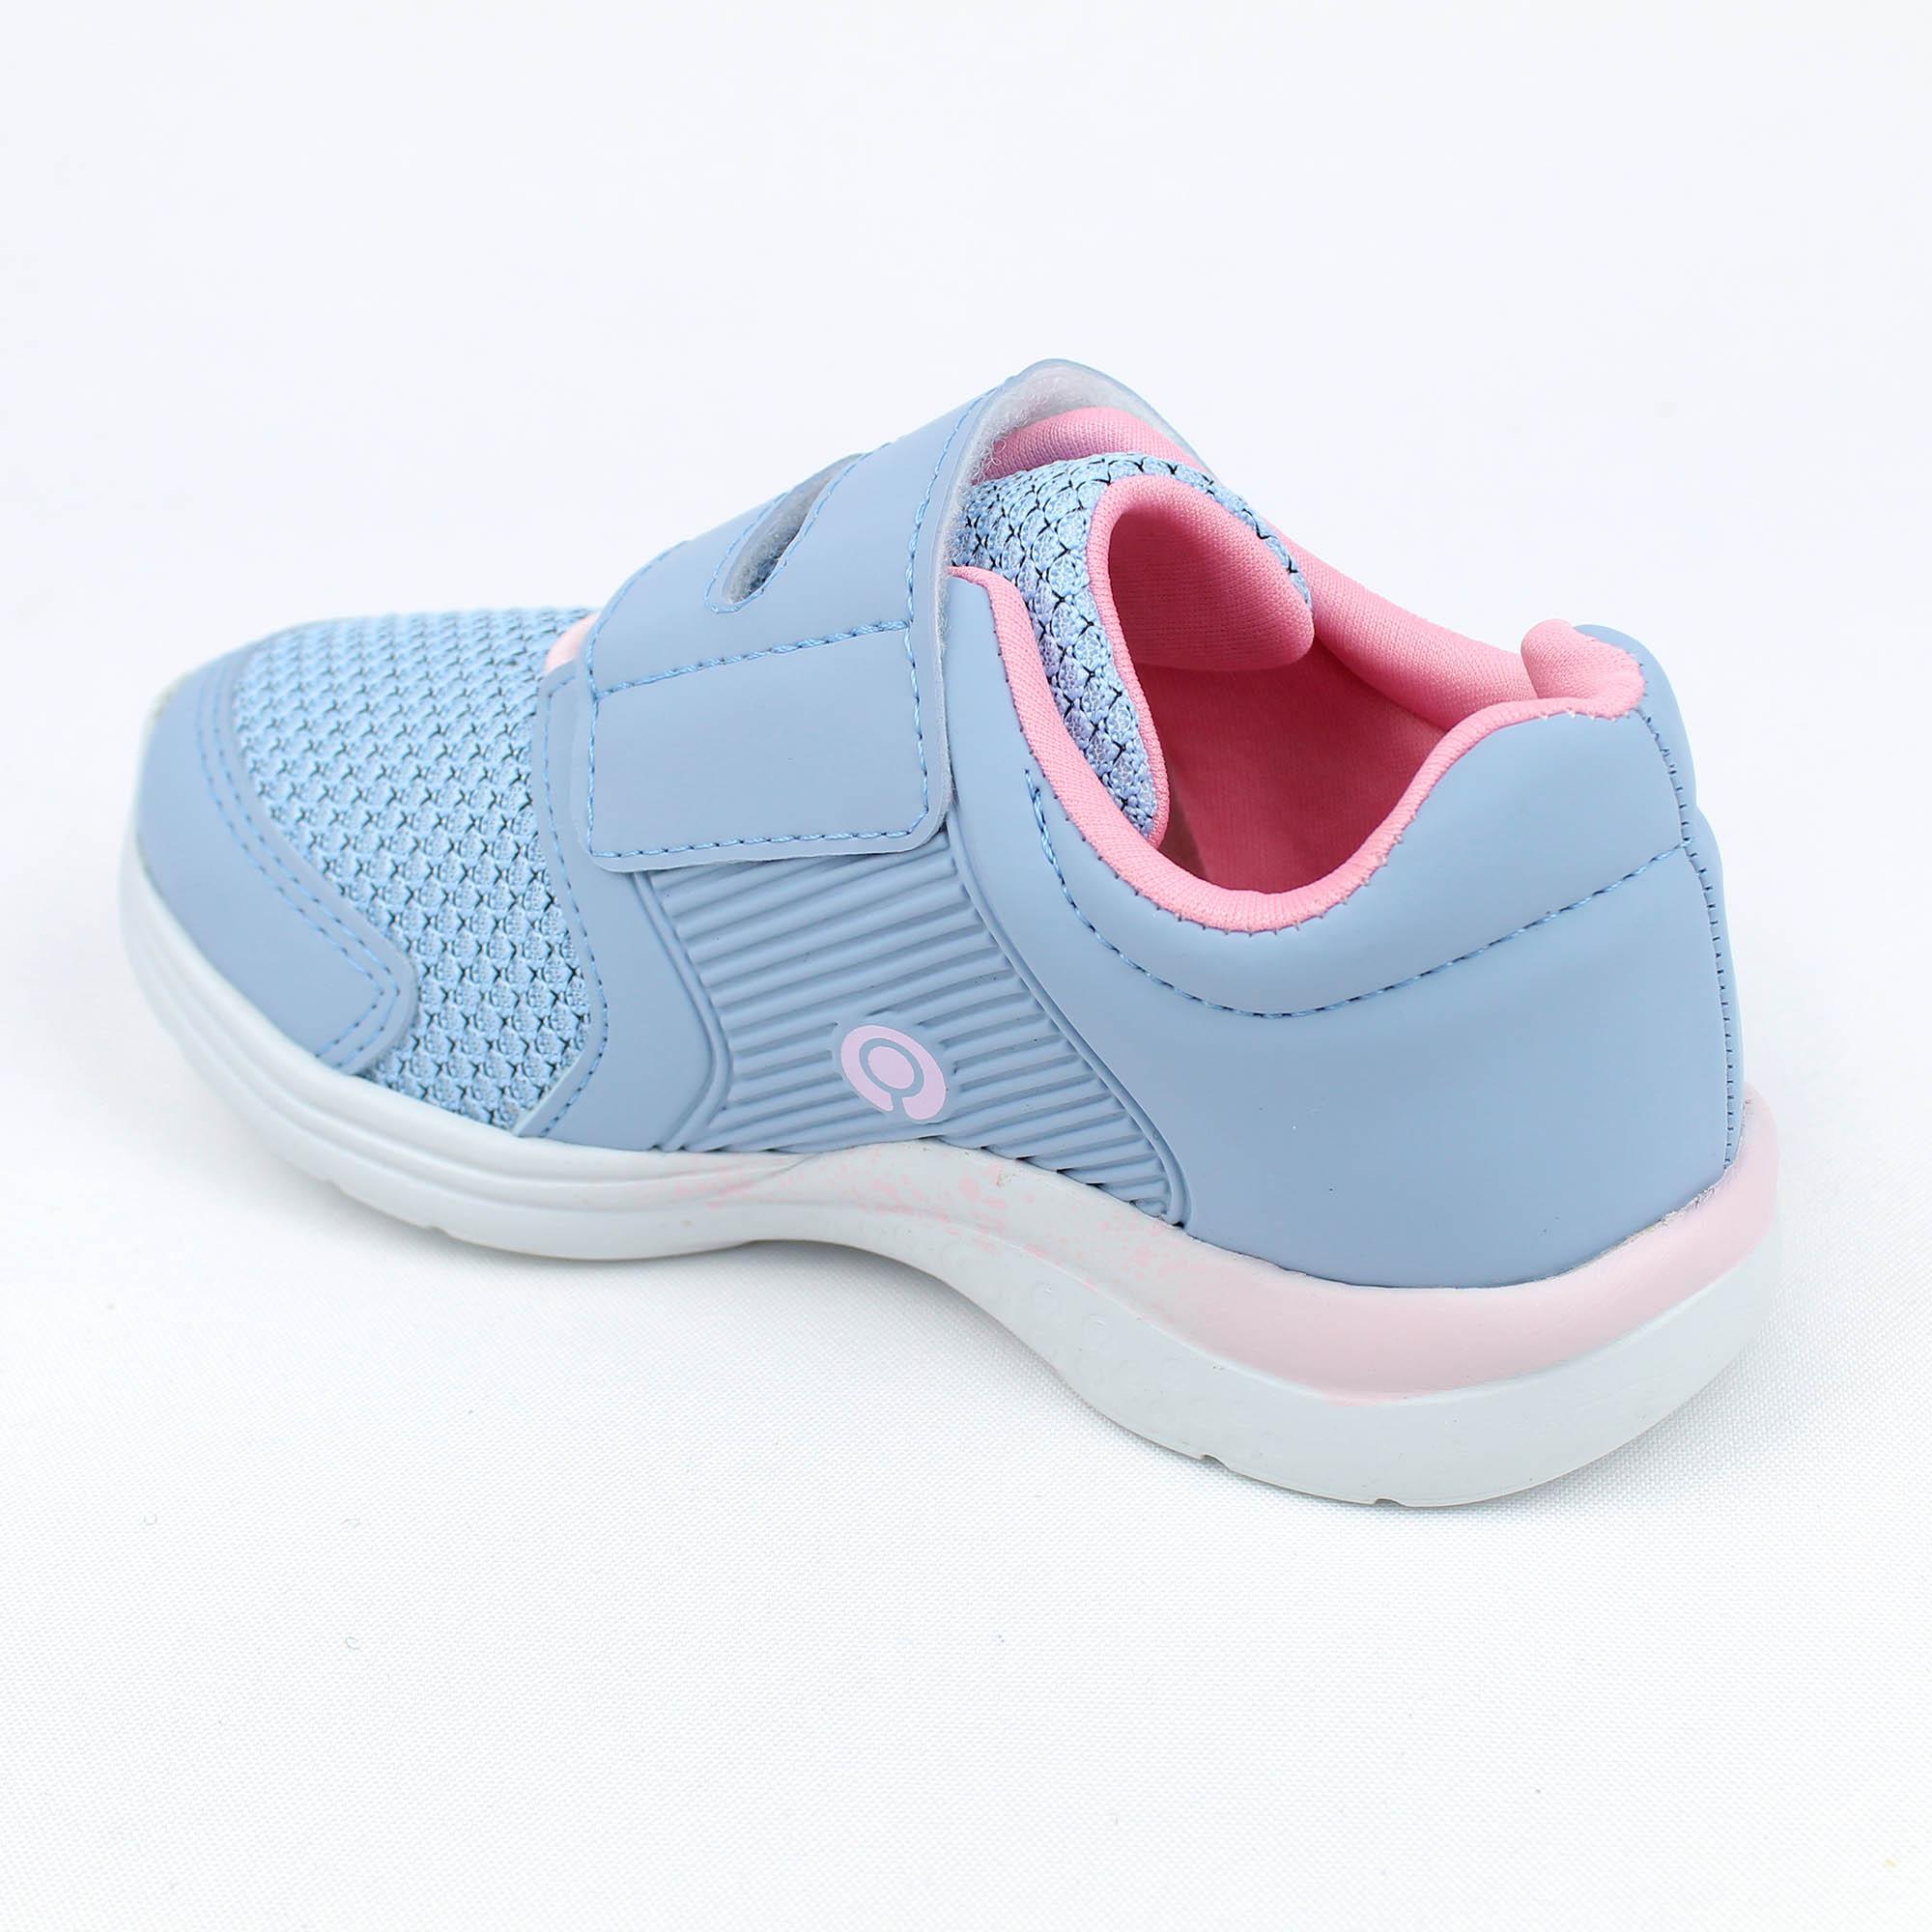 Tênis Infantil Ortopé Joy Confy 22017 Menina